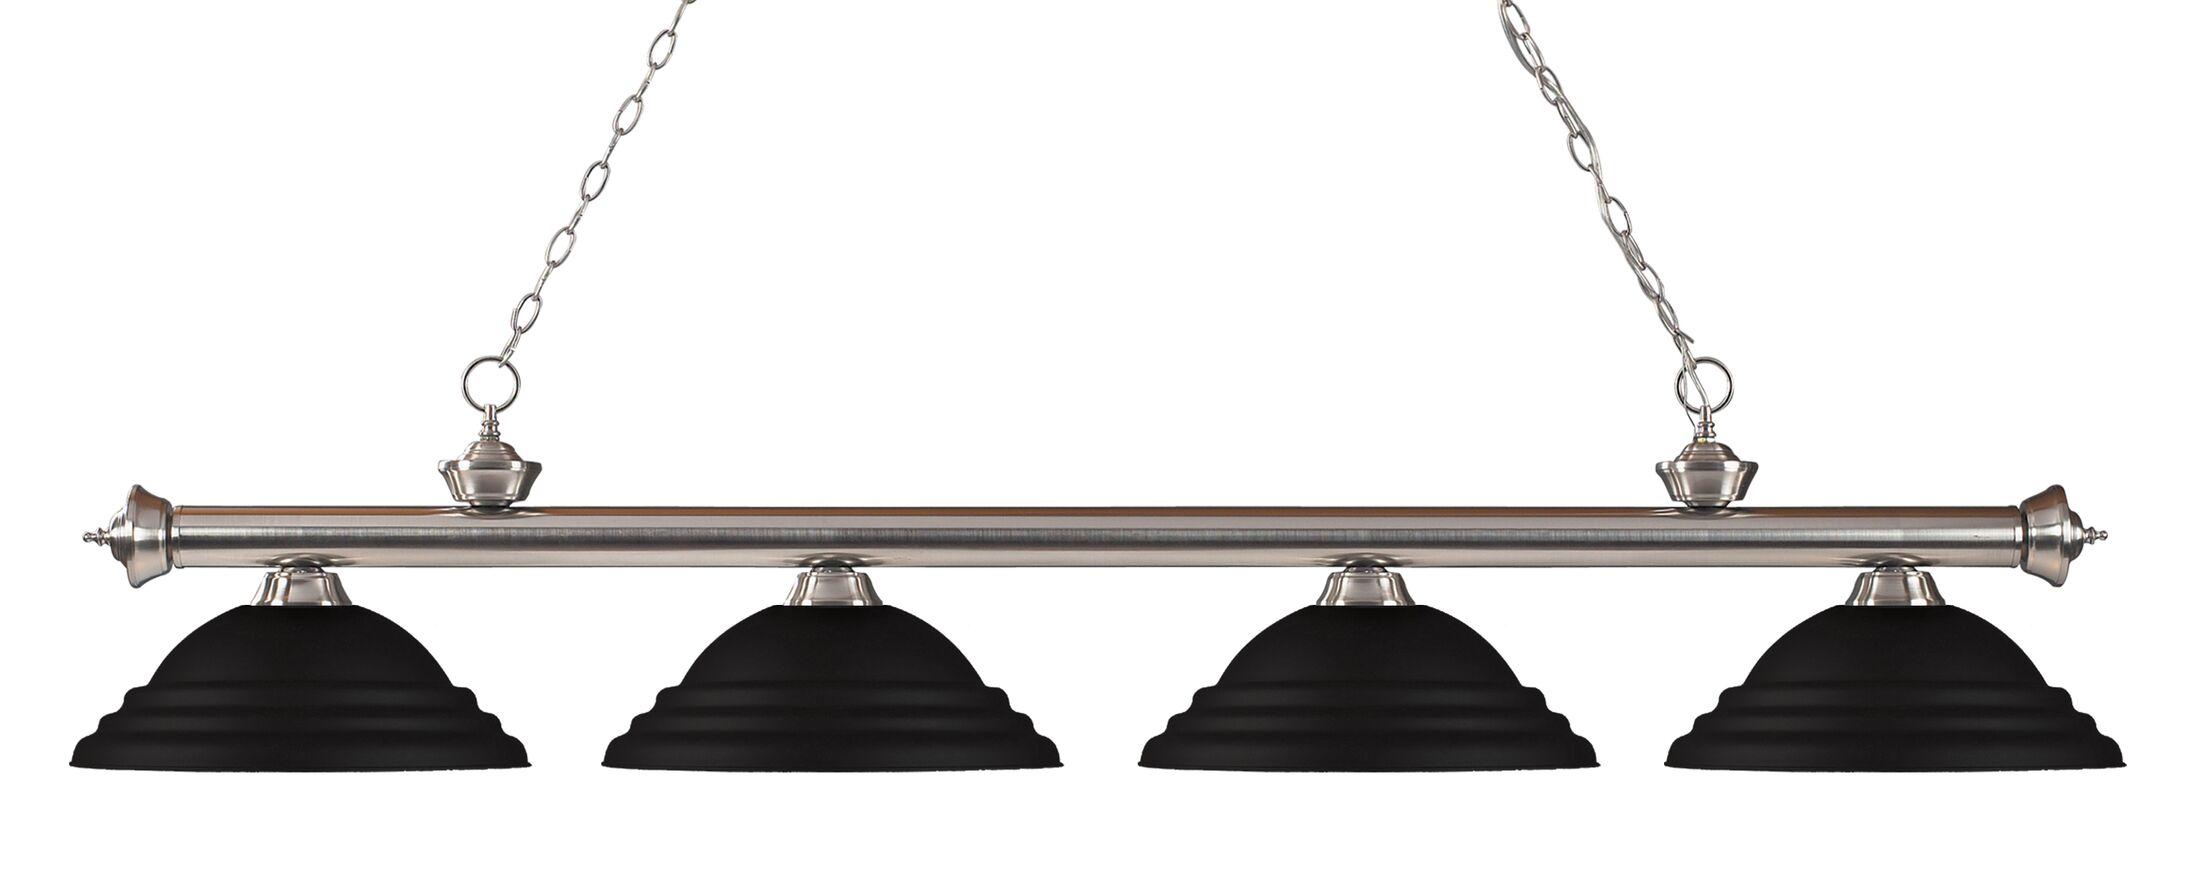 Zephyr 4-Light Metal Shade Kitchen Island Pendant Shade Color: Matte Black, Finish: Brushed Nickel